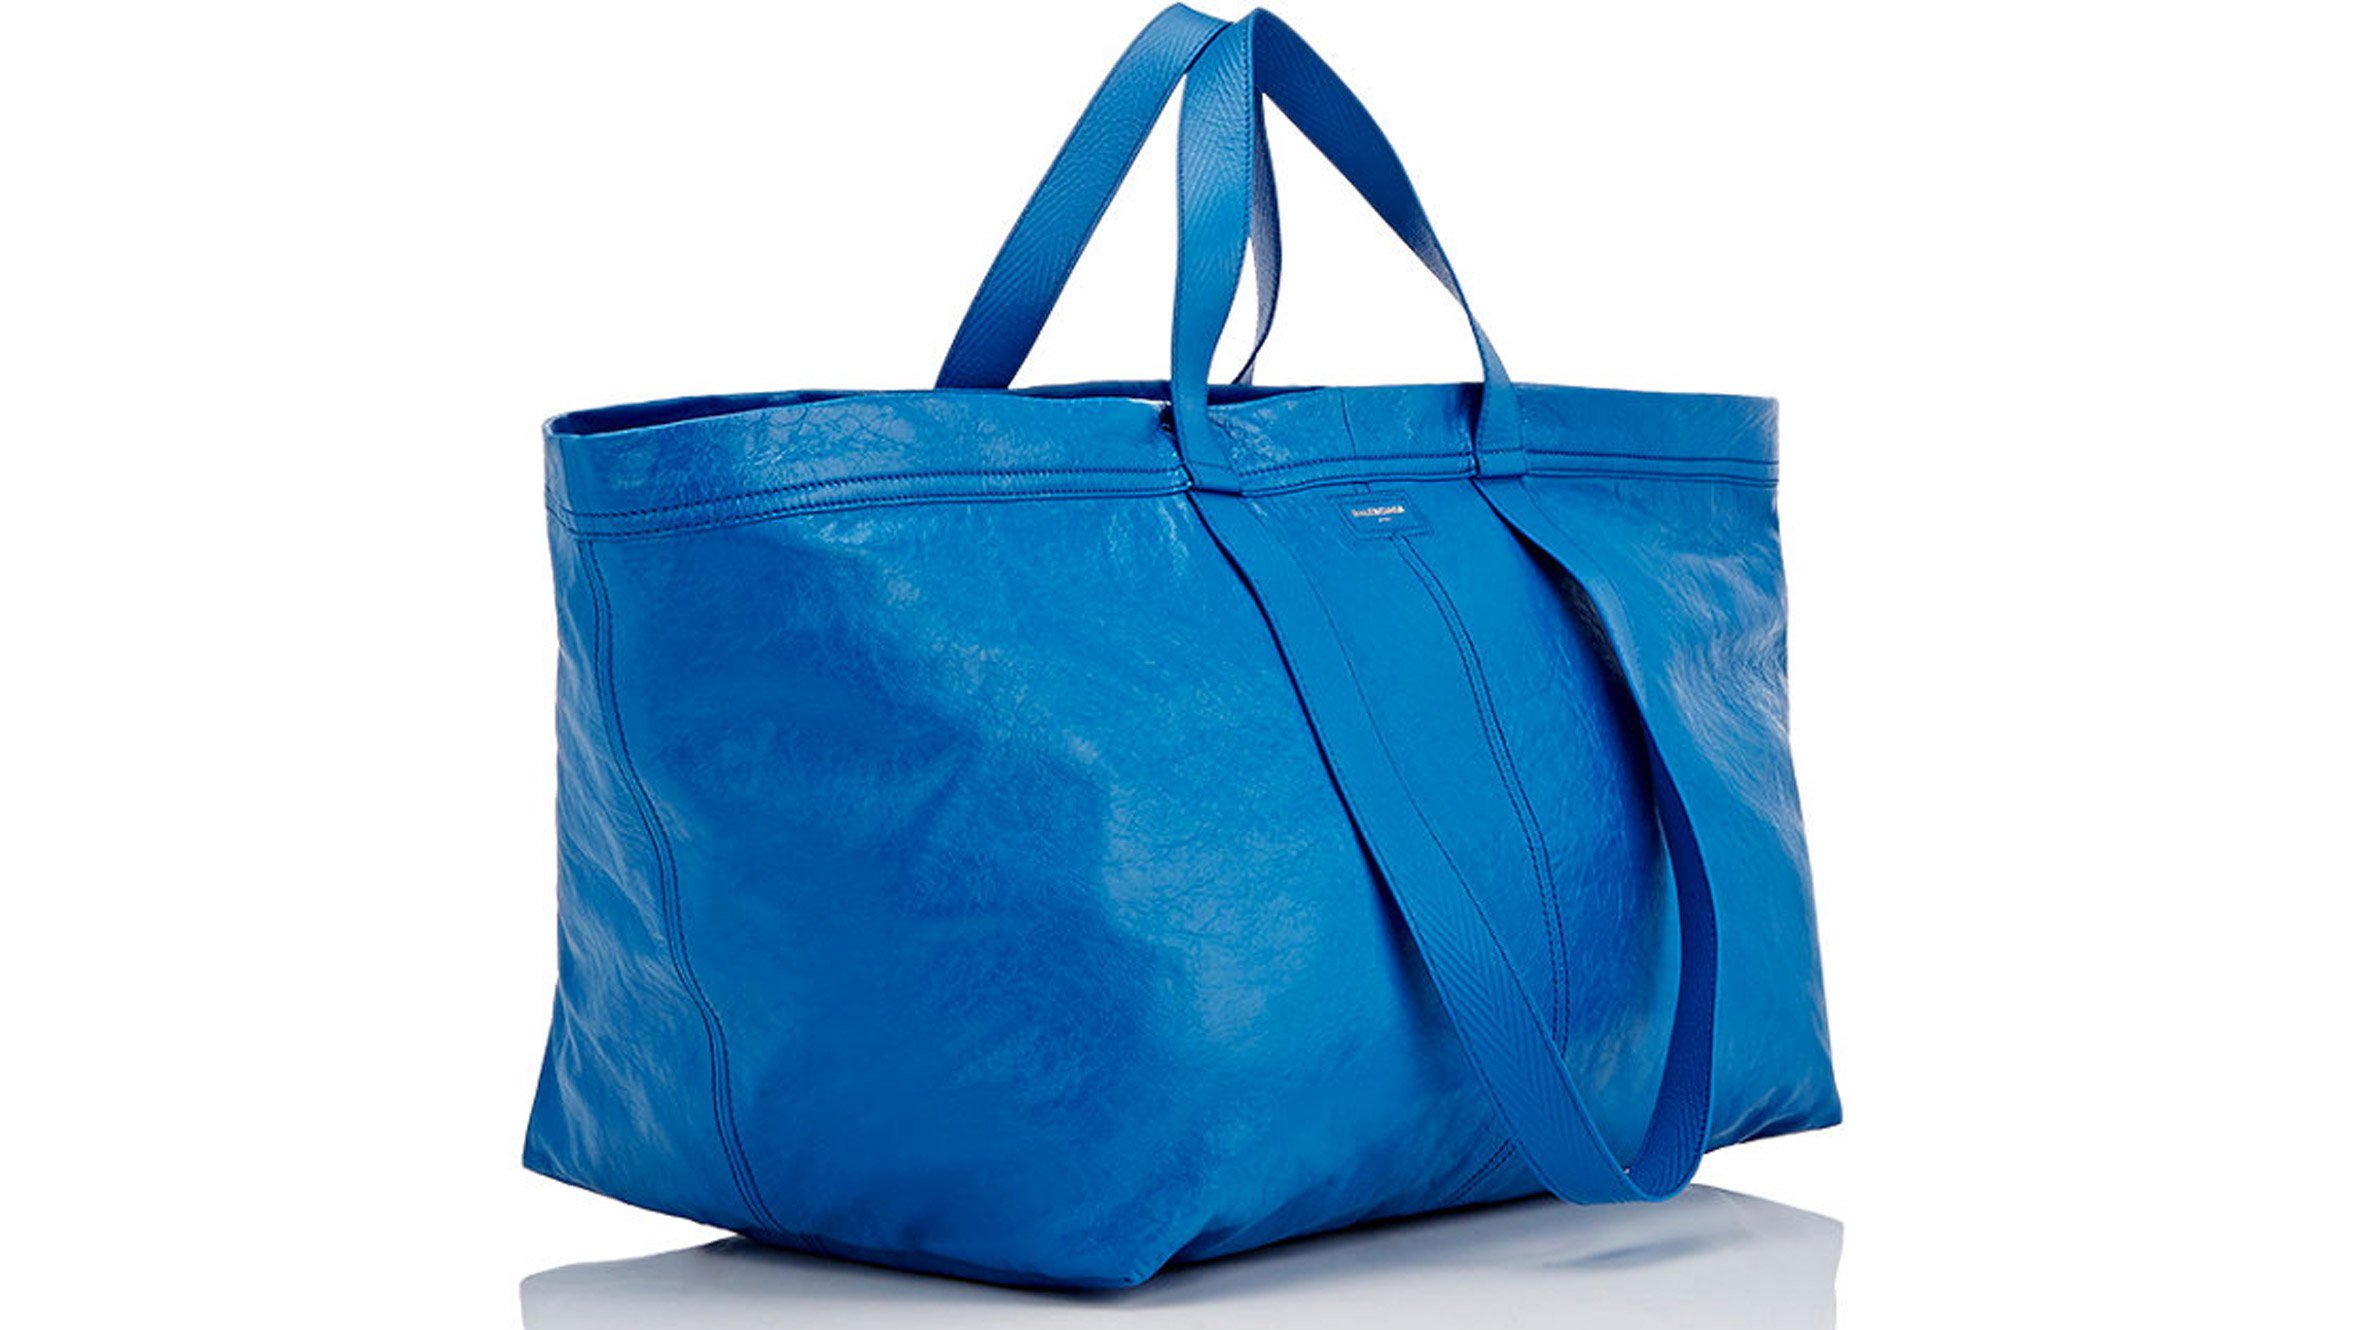 Balenciage sin versjon av den blå vesken